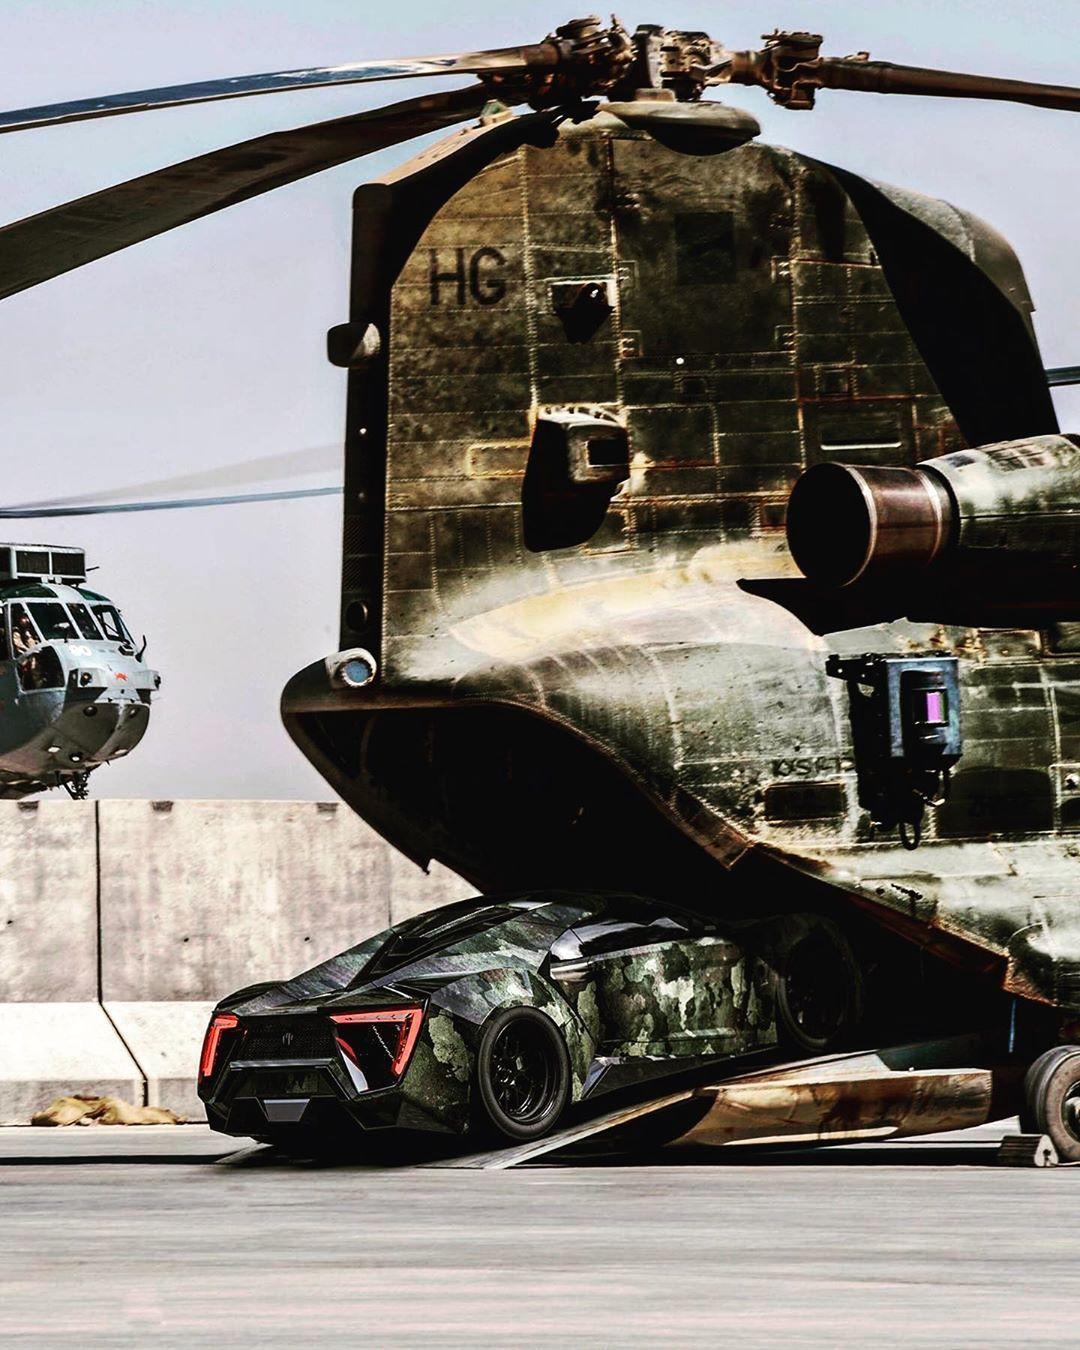 L�ks Otombil Mor  #cars #luxurycars #sportcars #conceptcars #motorcycles #trucks